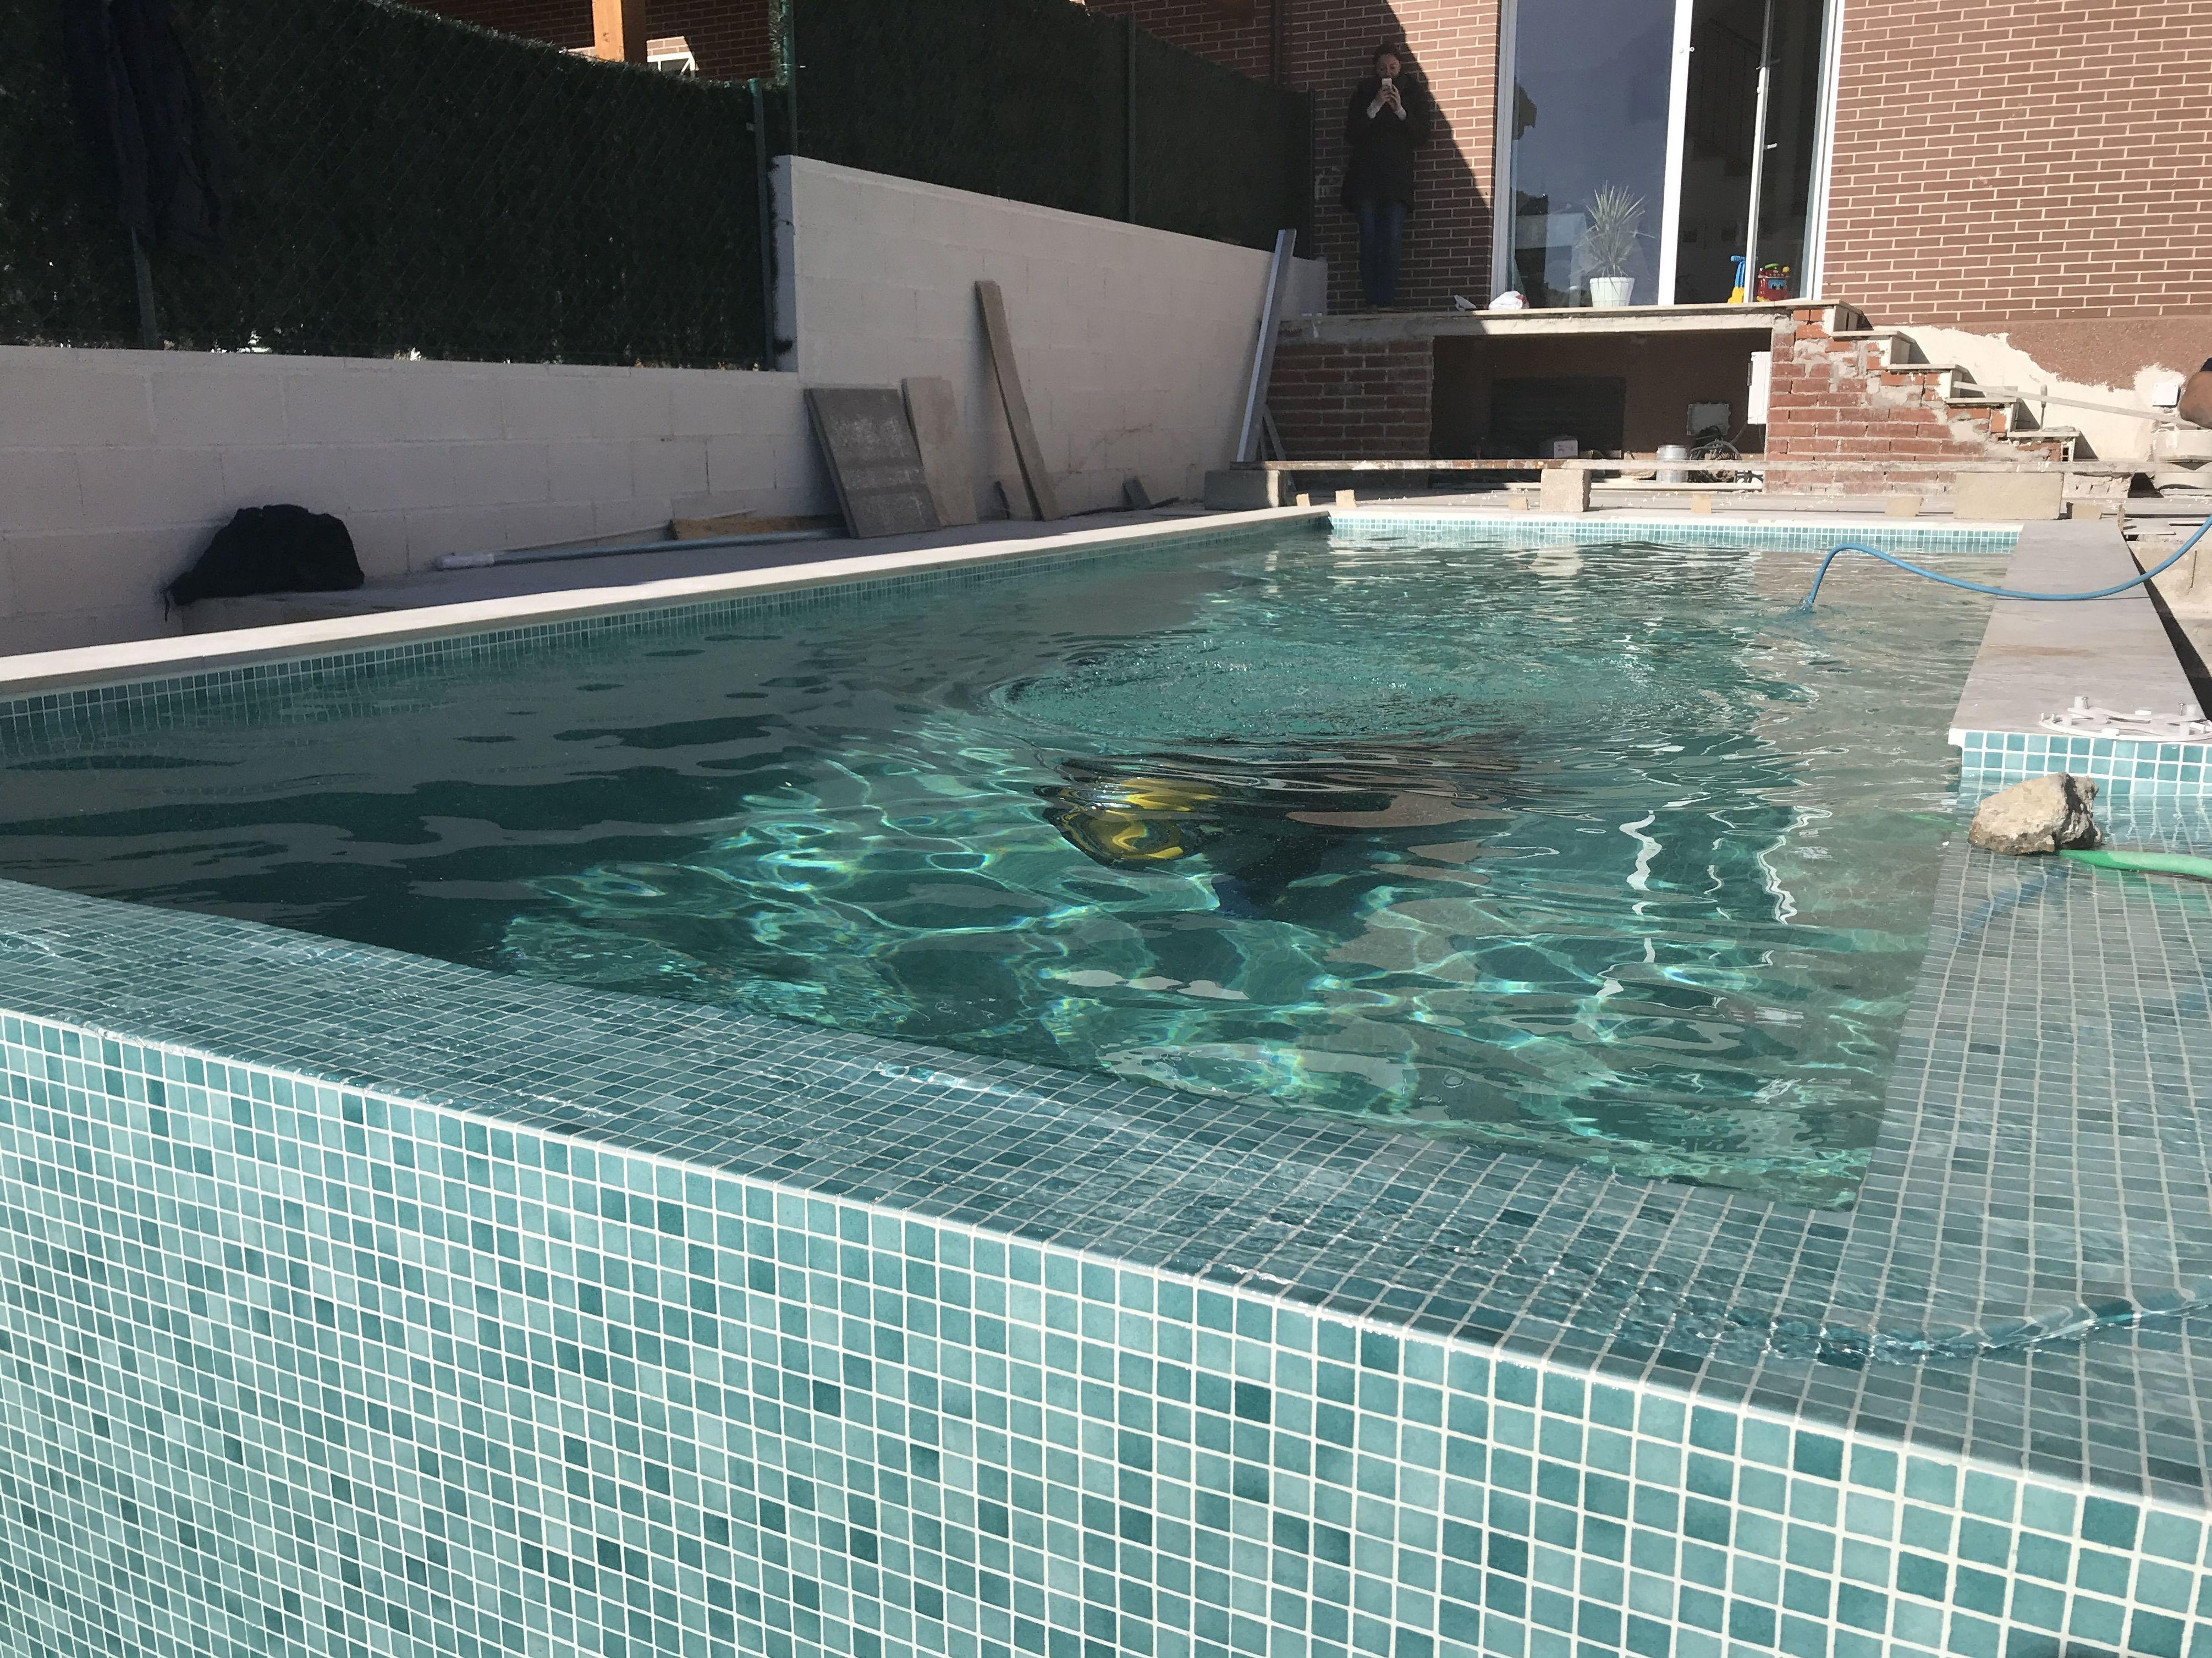 búsqueda de fugas en piscina